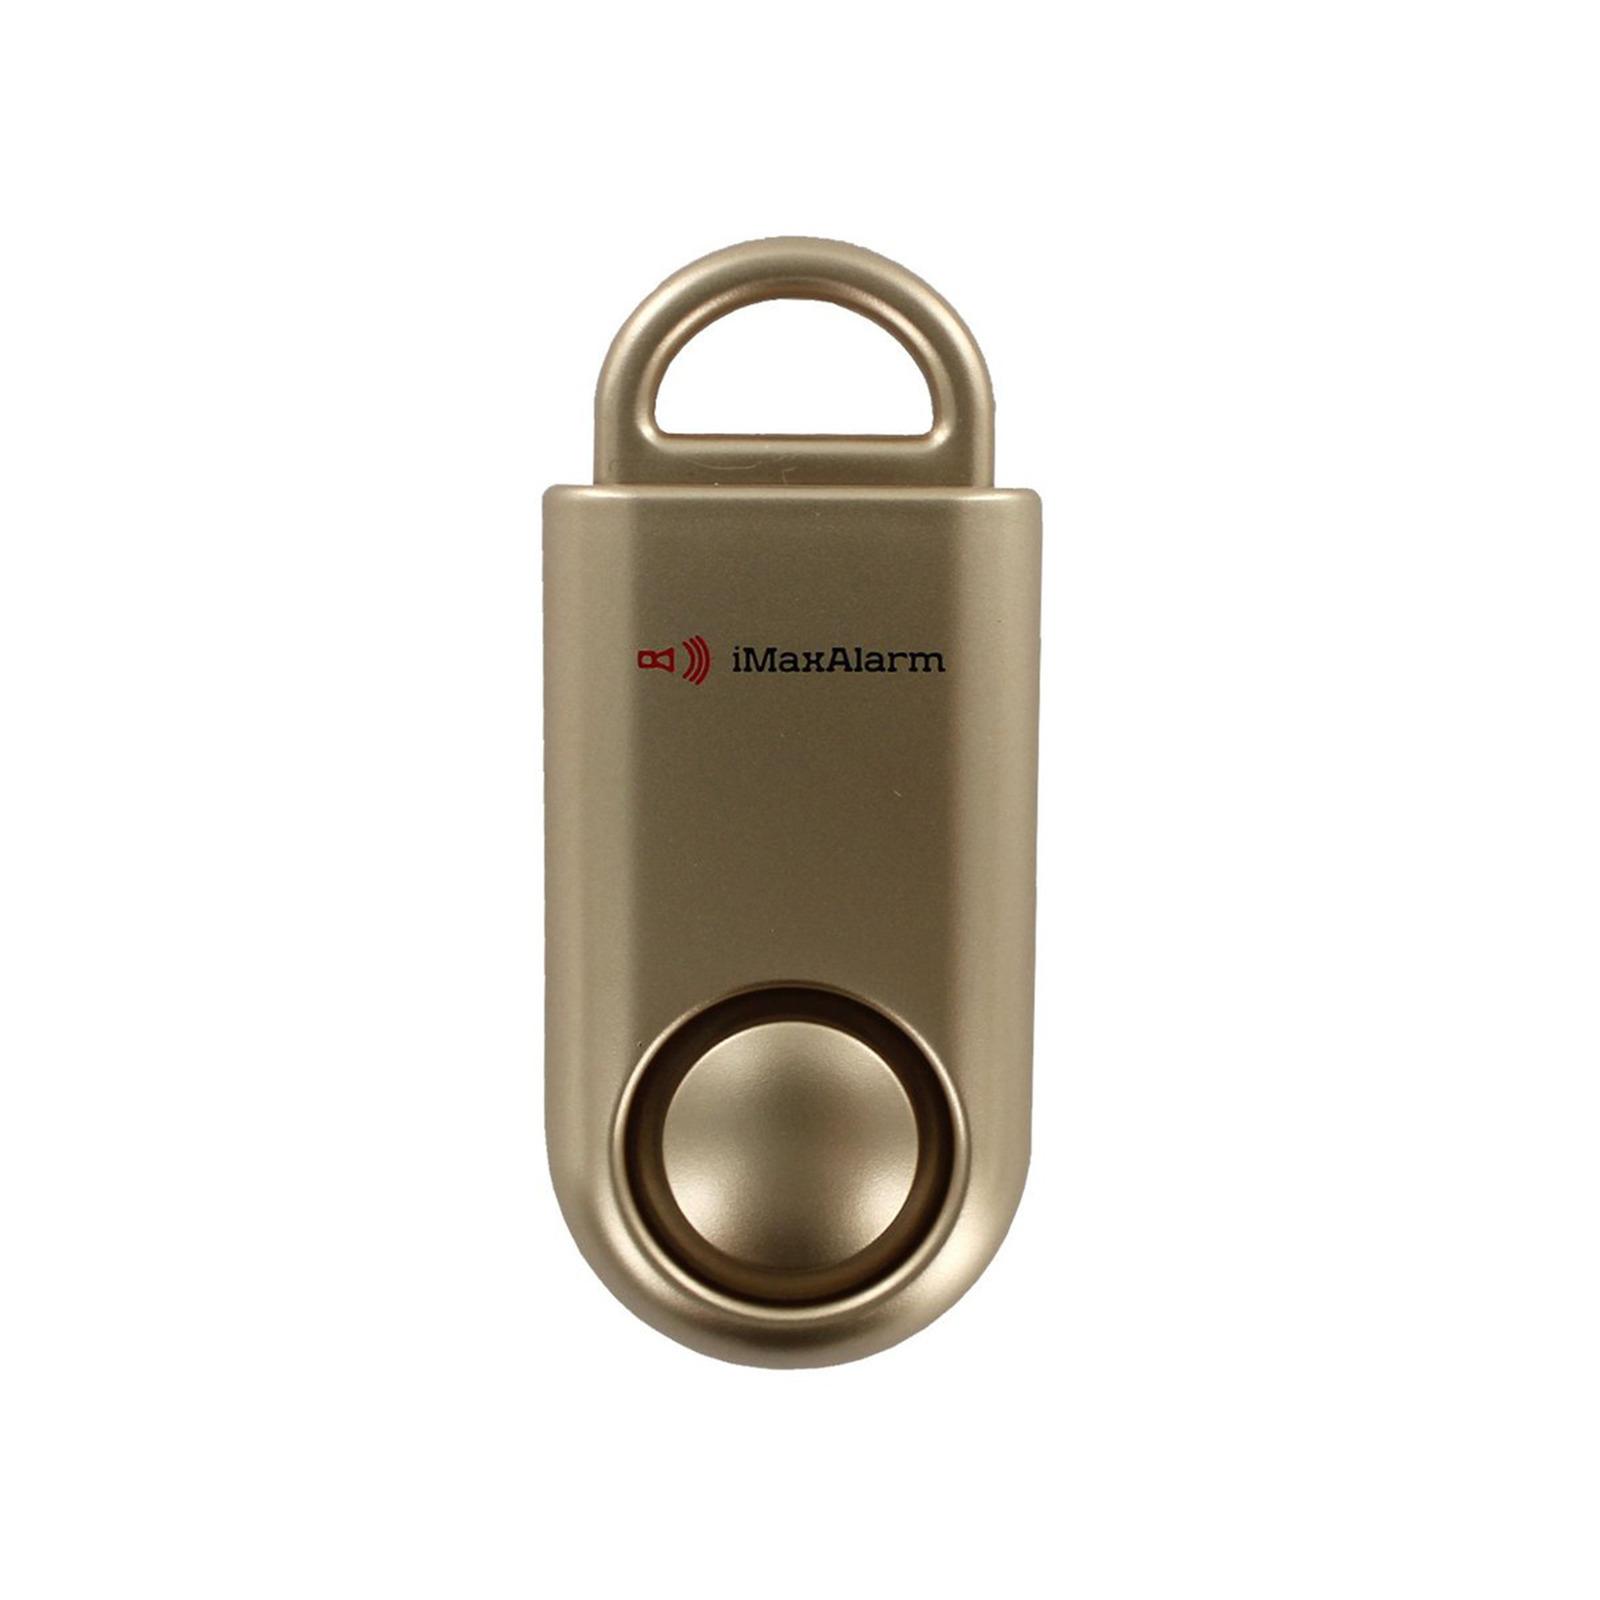 iMaxAlarm Portable SOS Alert Personal Security Alarm (Gold)